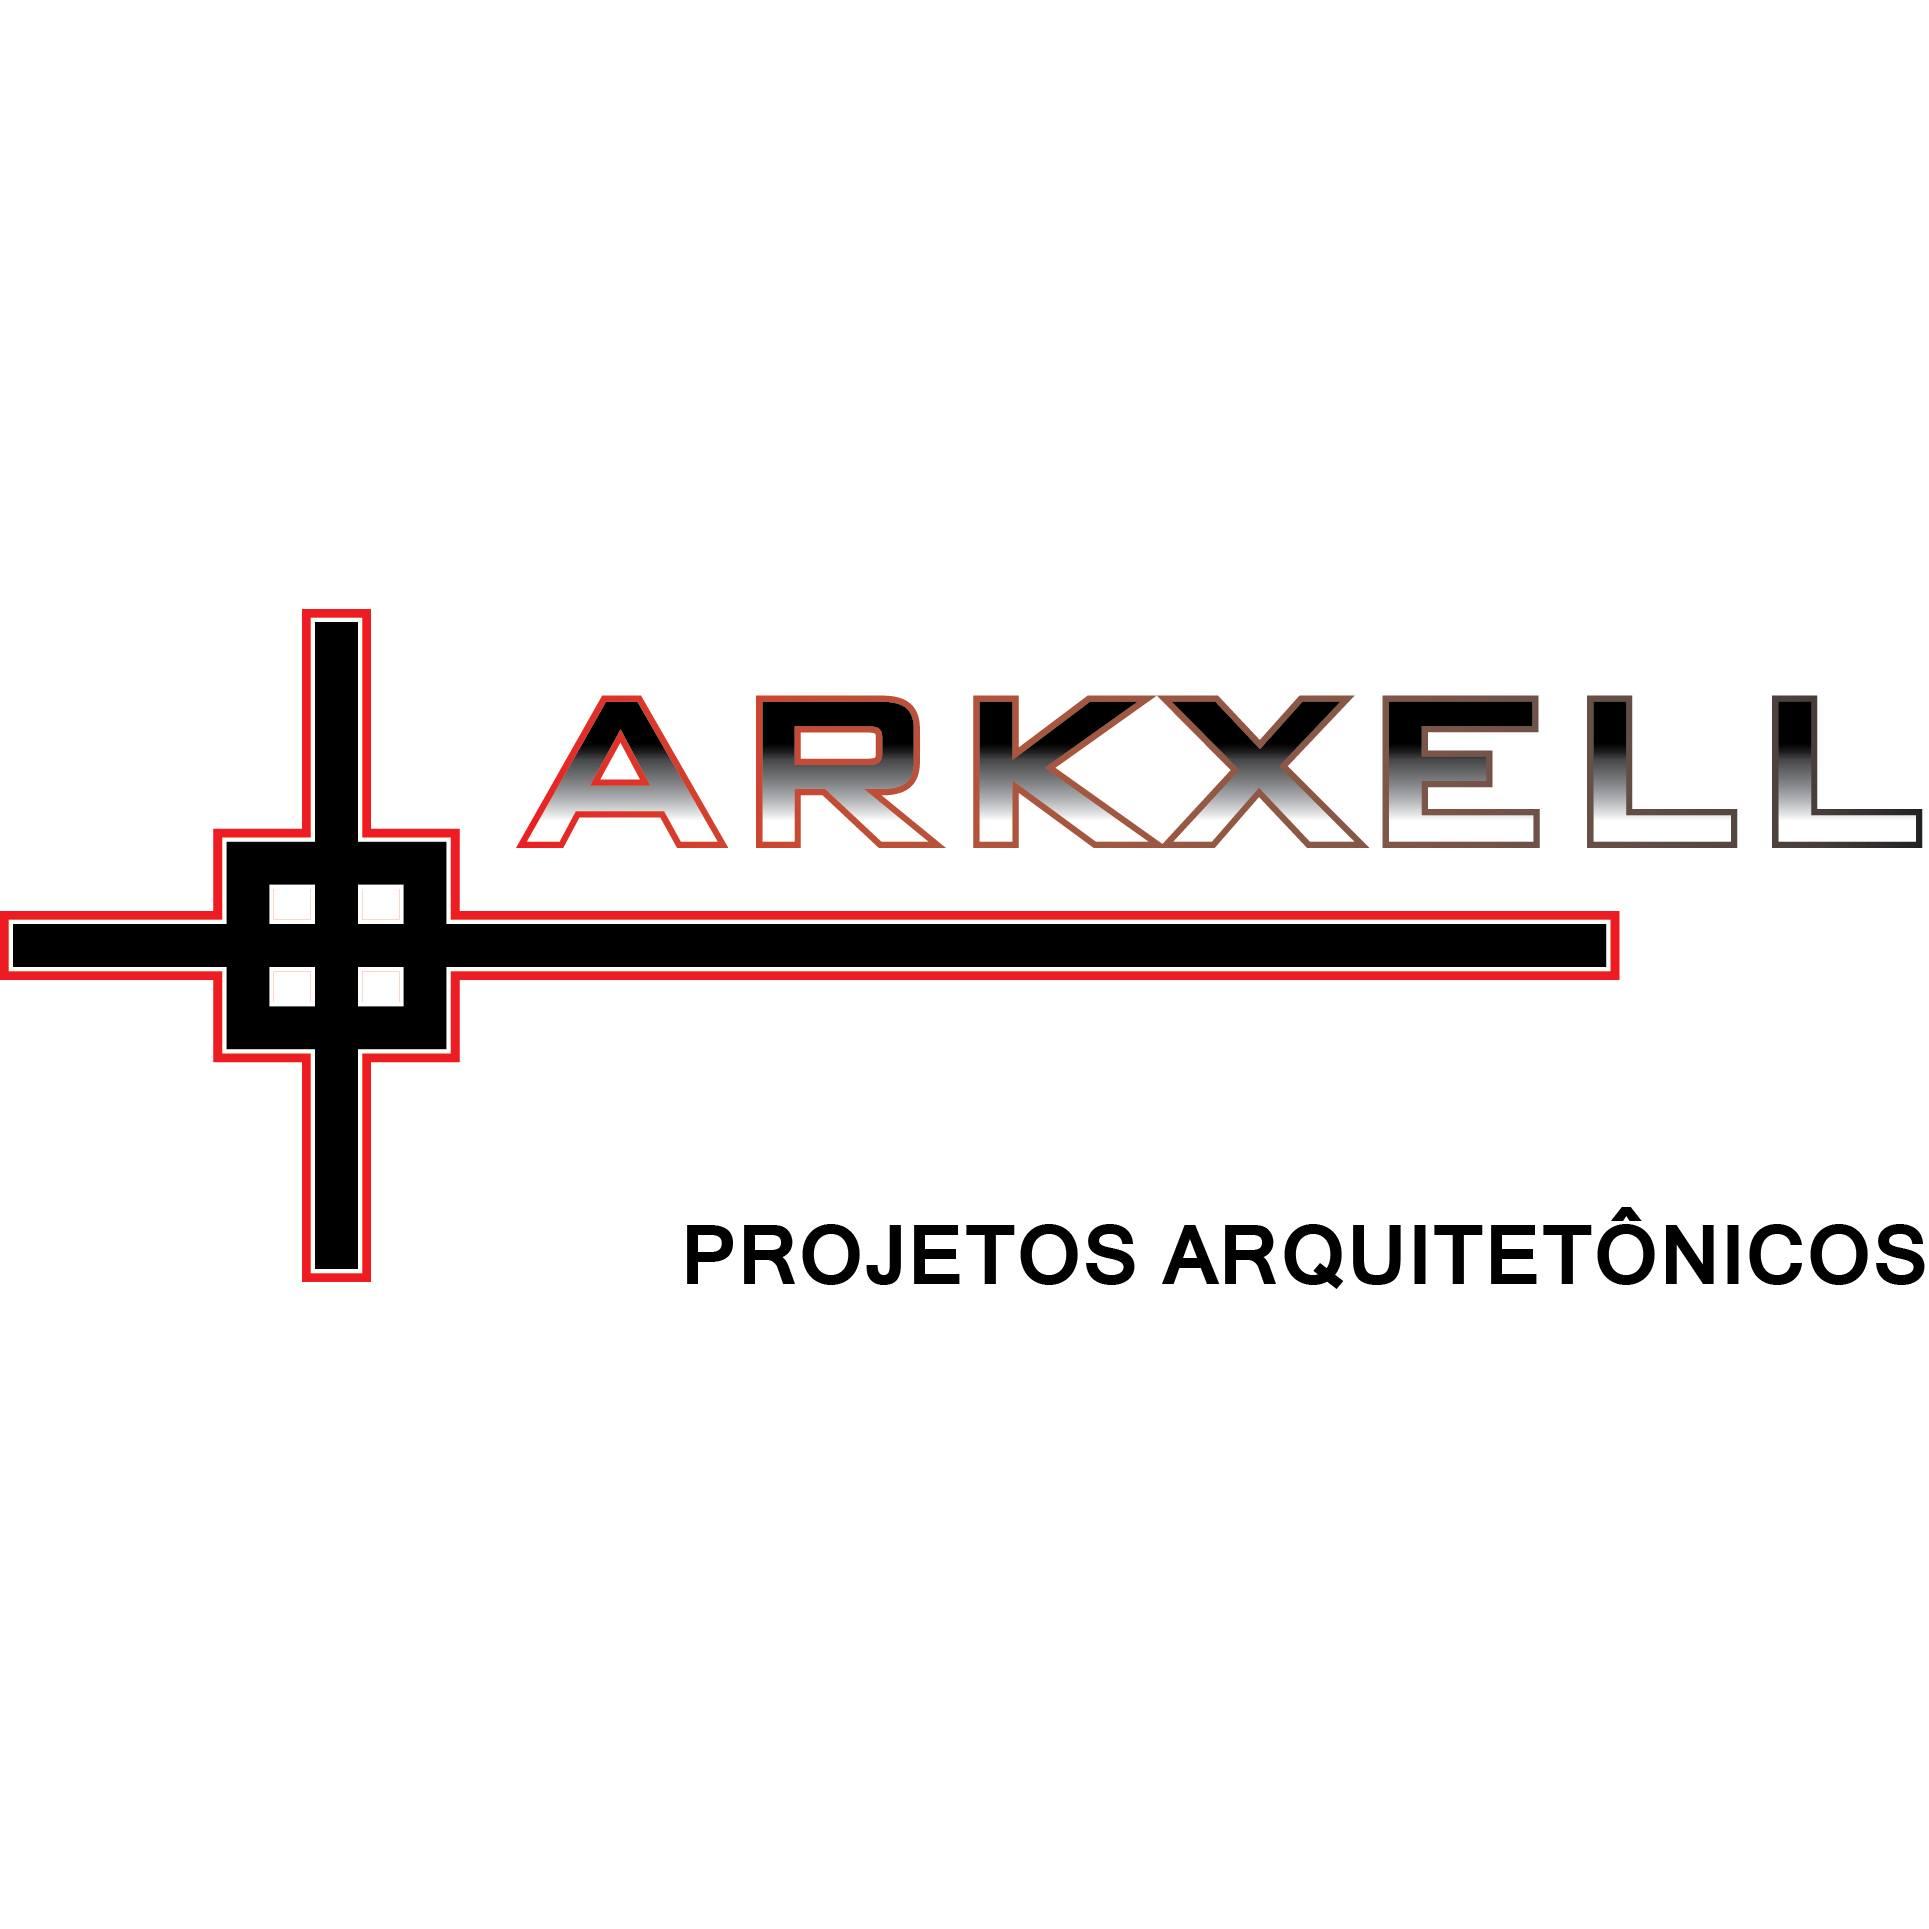 ARKXELL - Projetos Arquitetônicos Logo